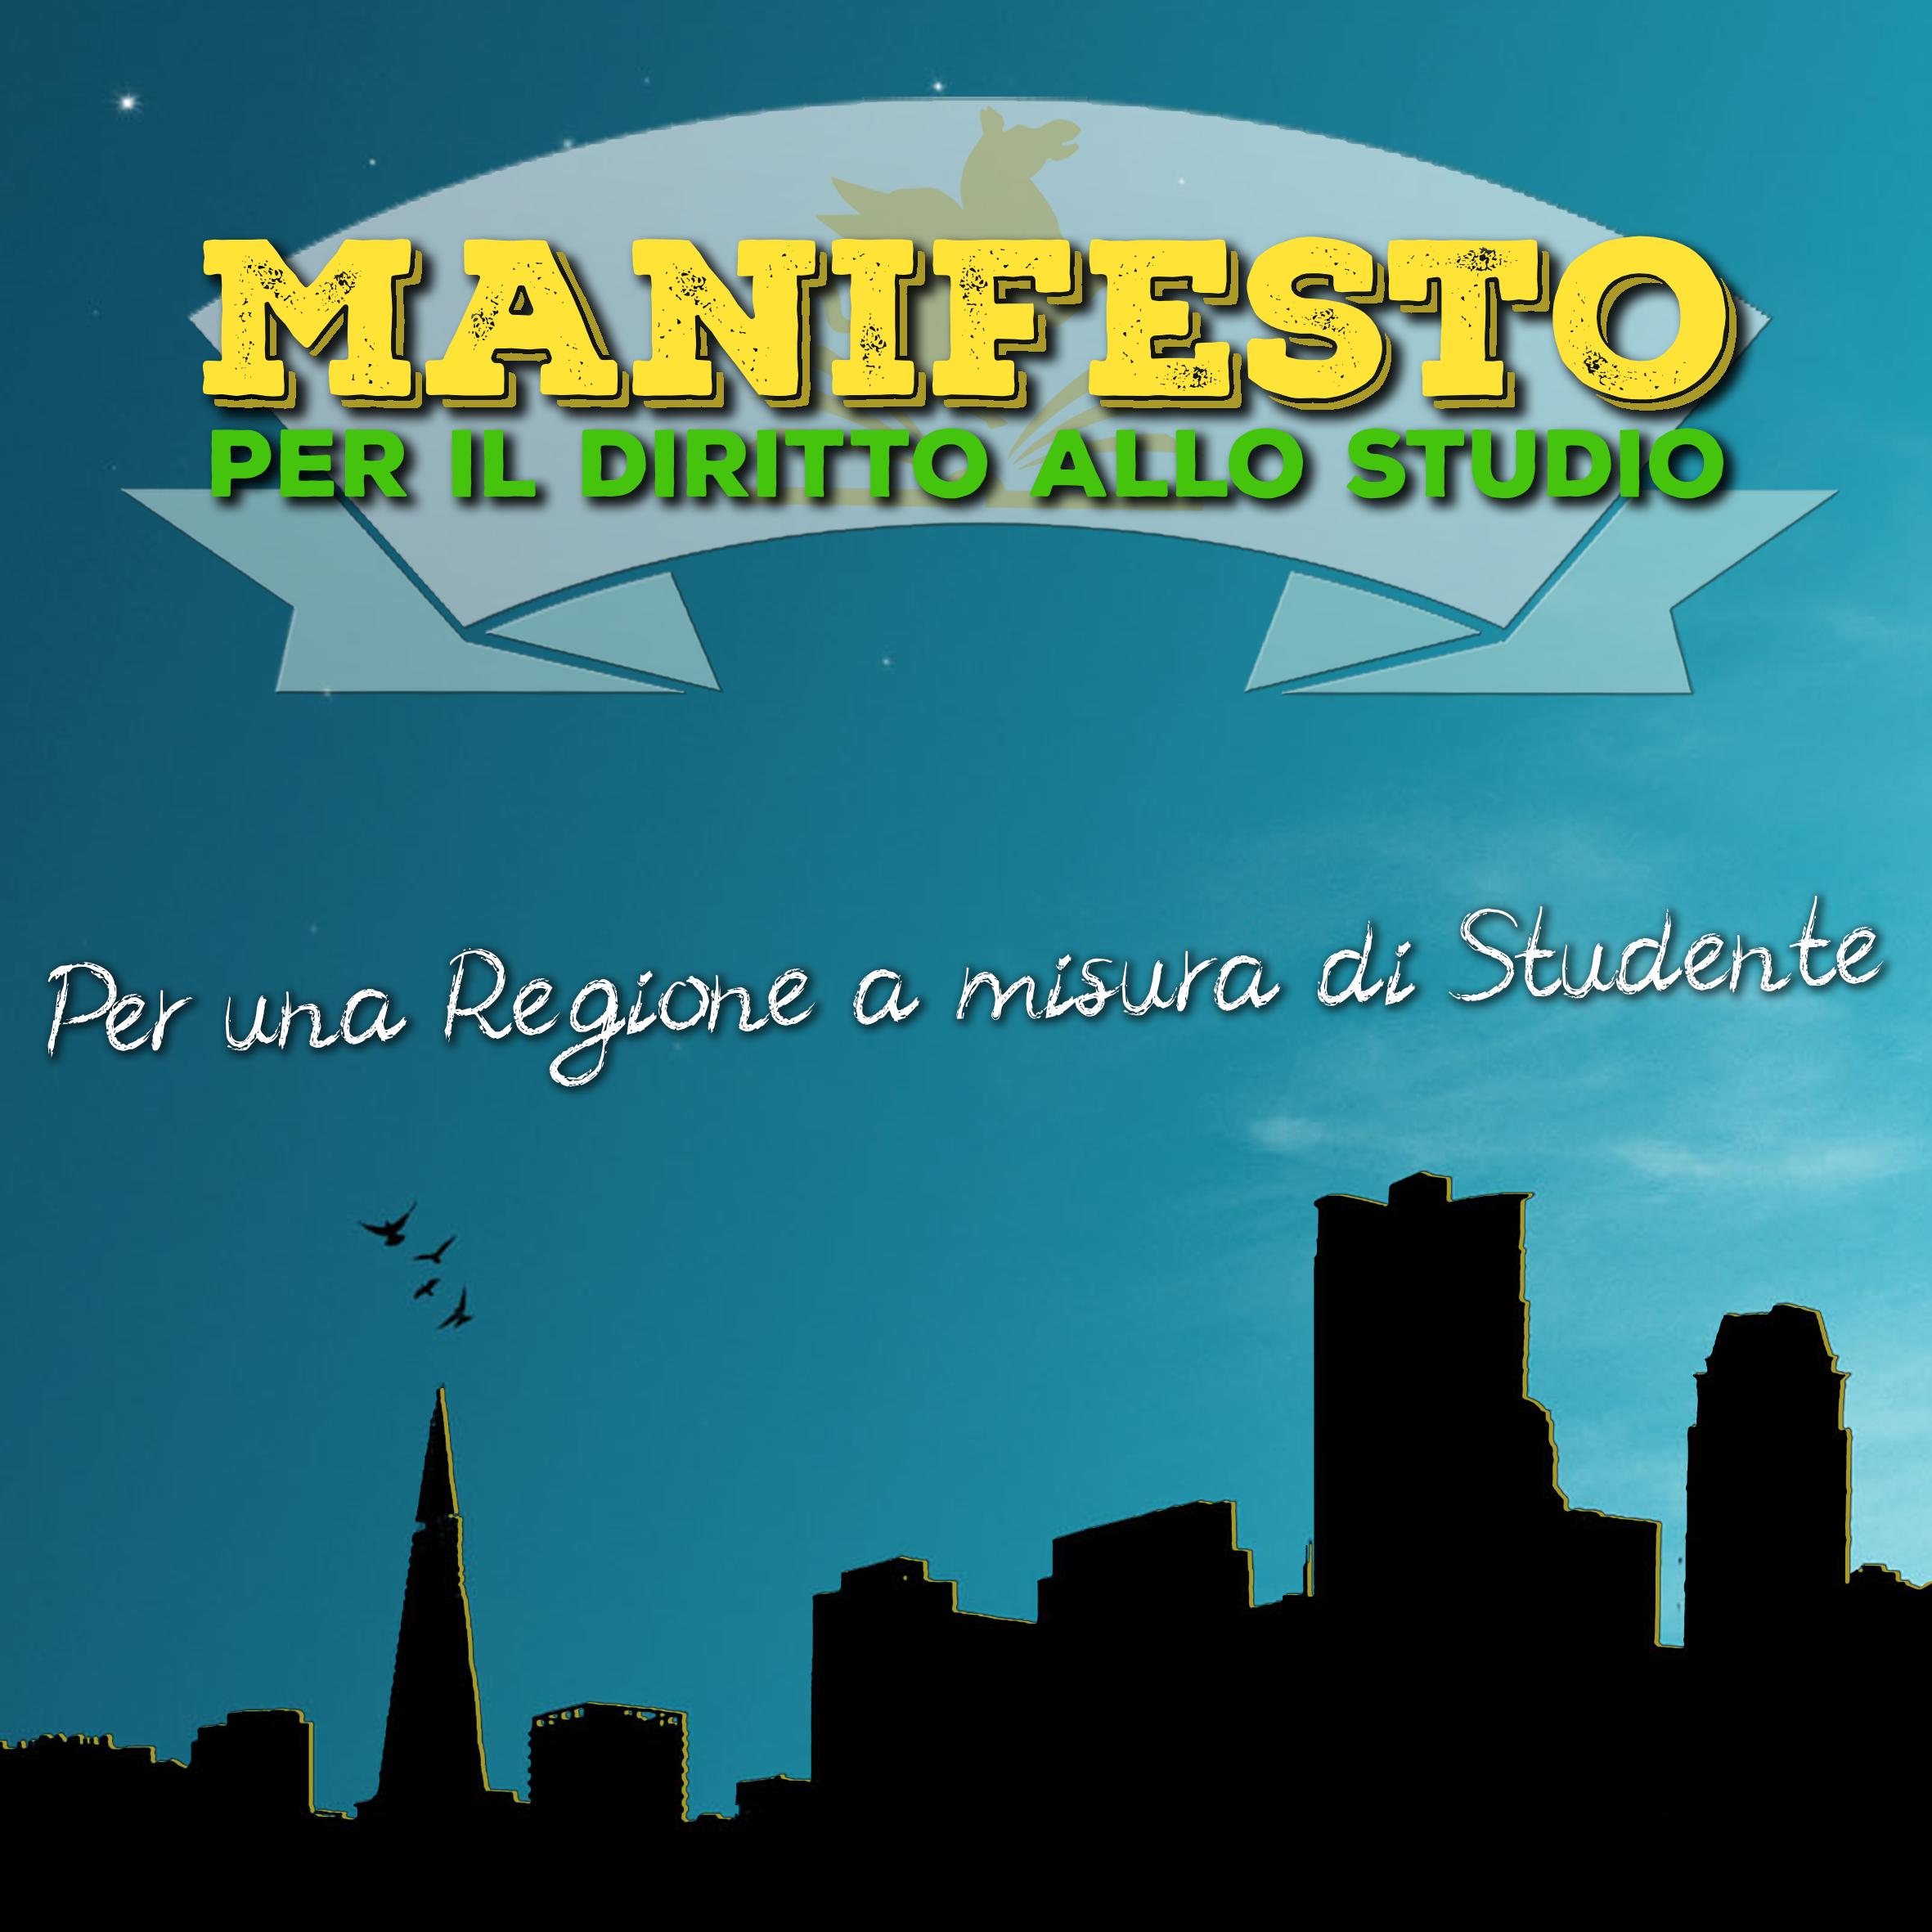 manifesto dsu